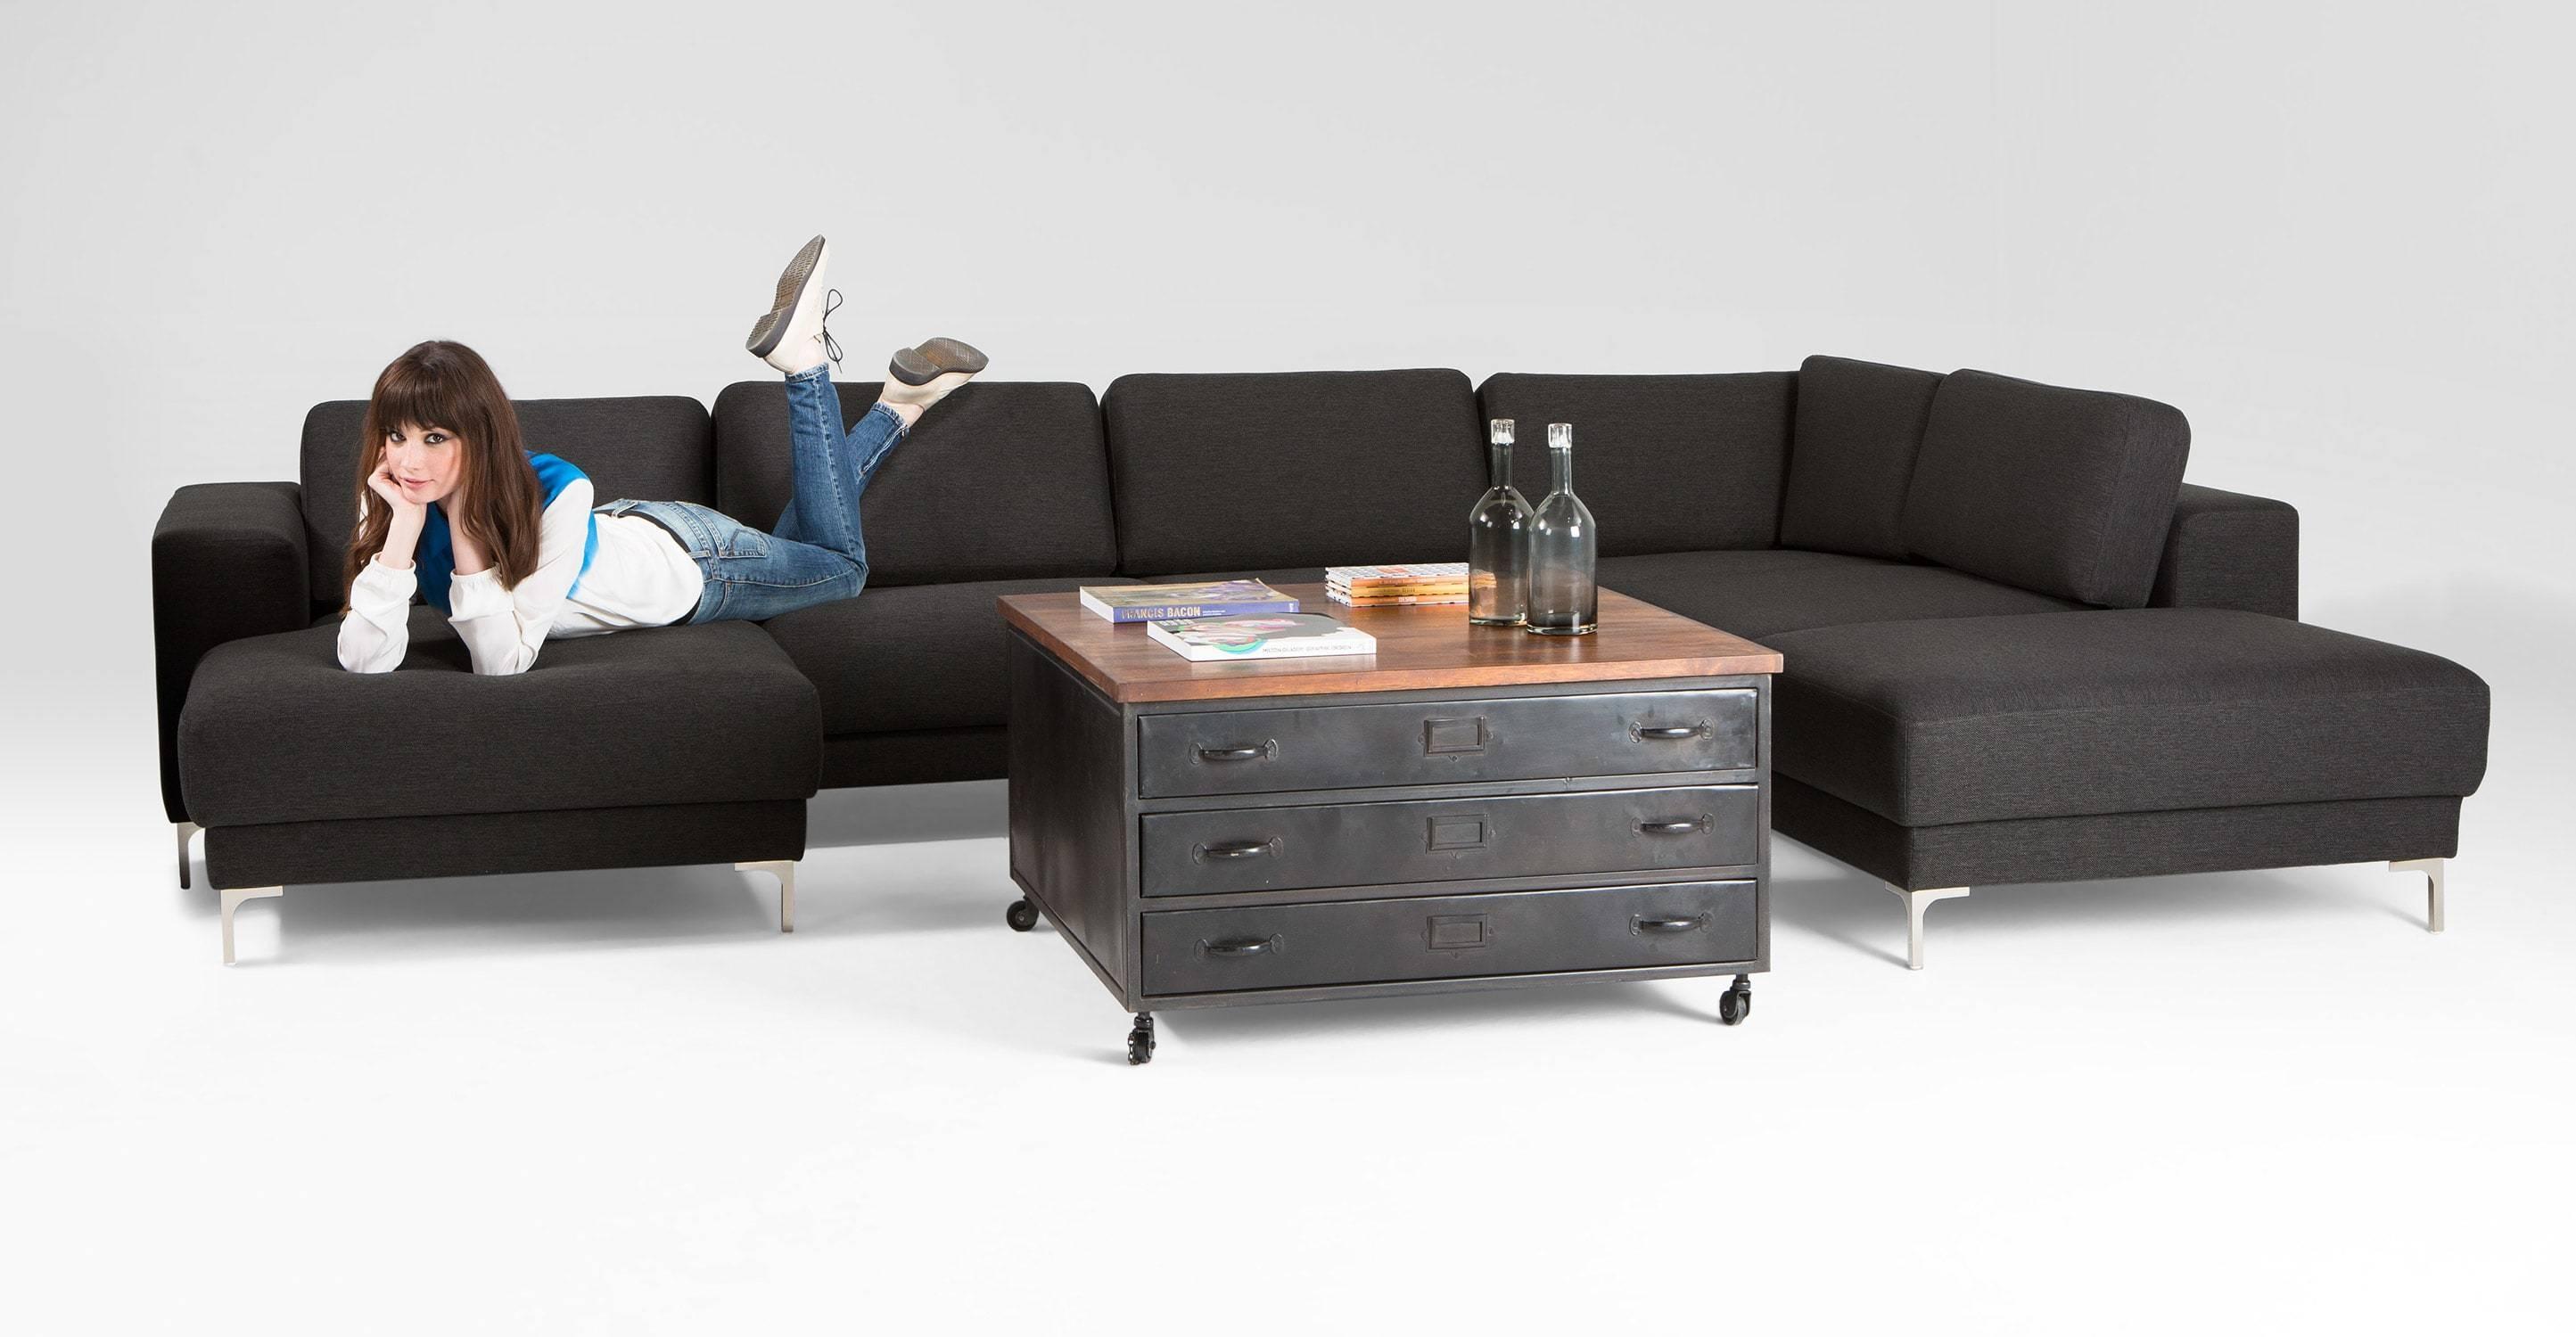 Bartoli Large Corner Unit Sofa In Whistler Grey | Made intended for Sofa Corner Units (Image 2 of 30)